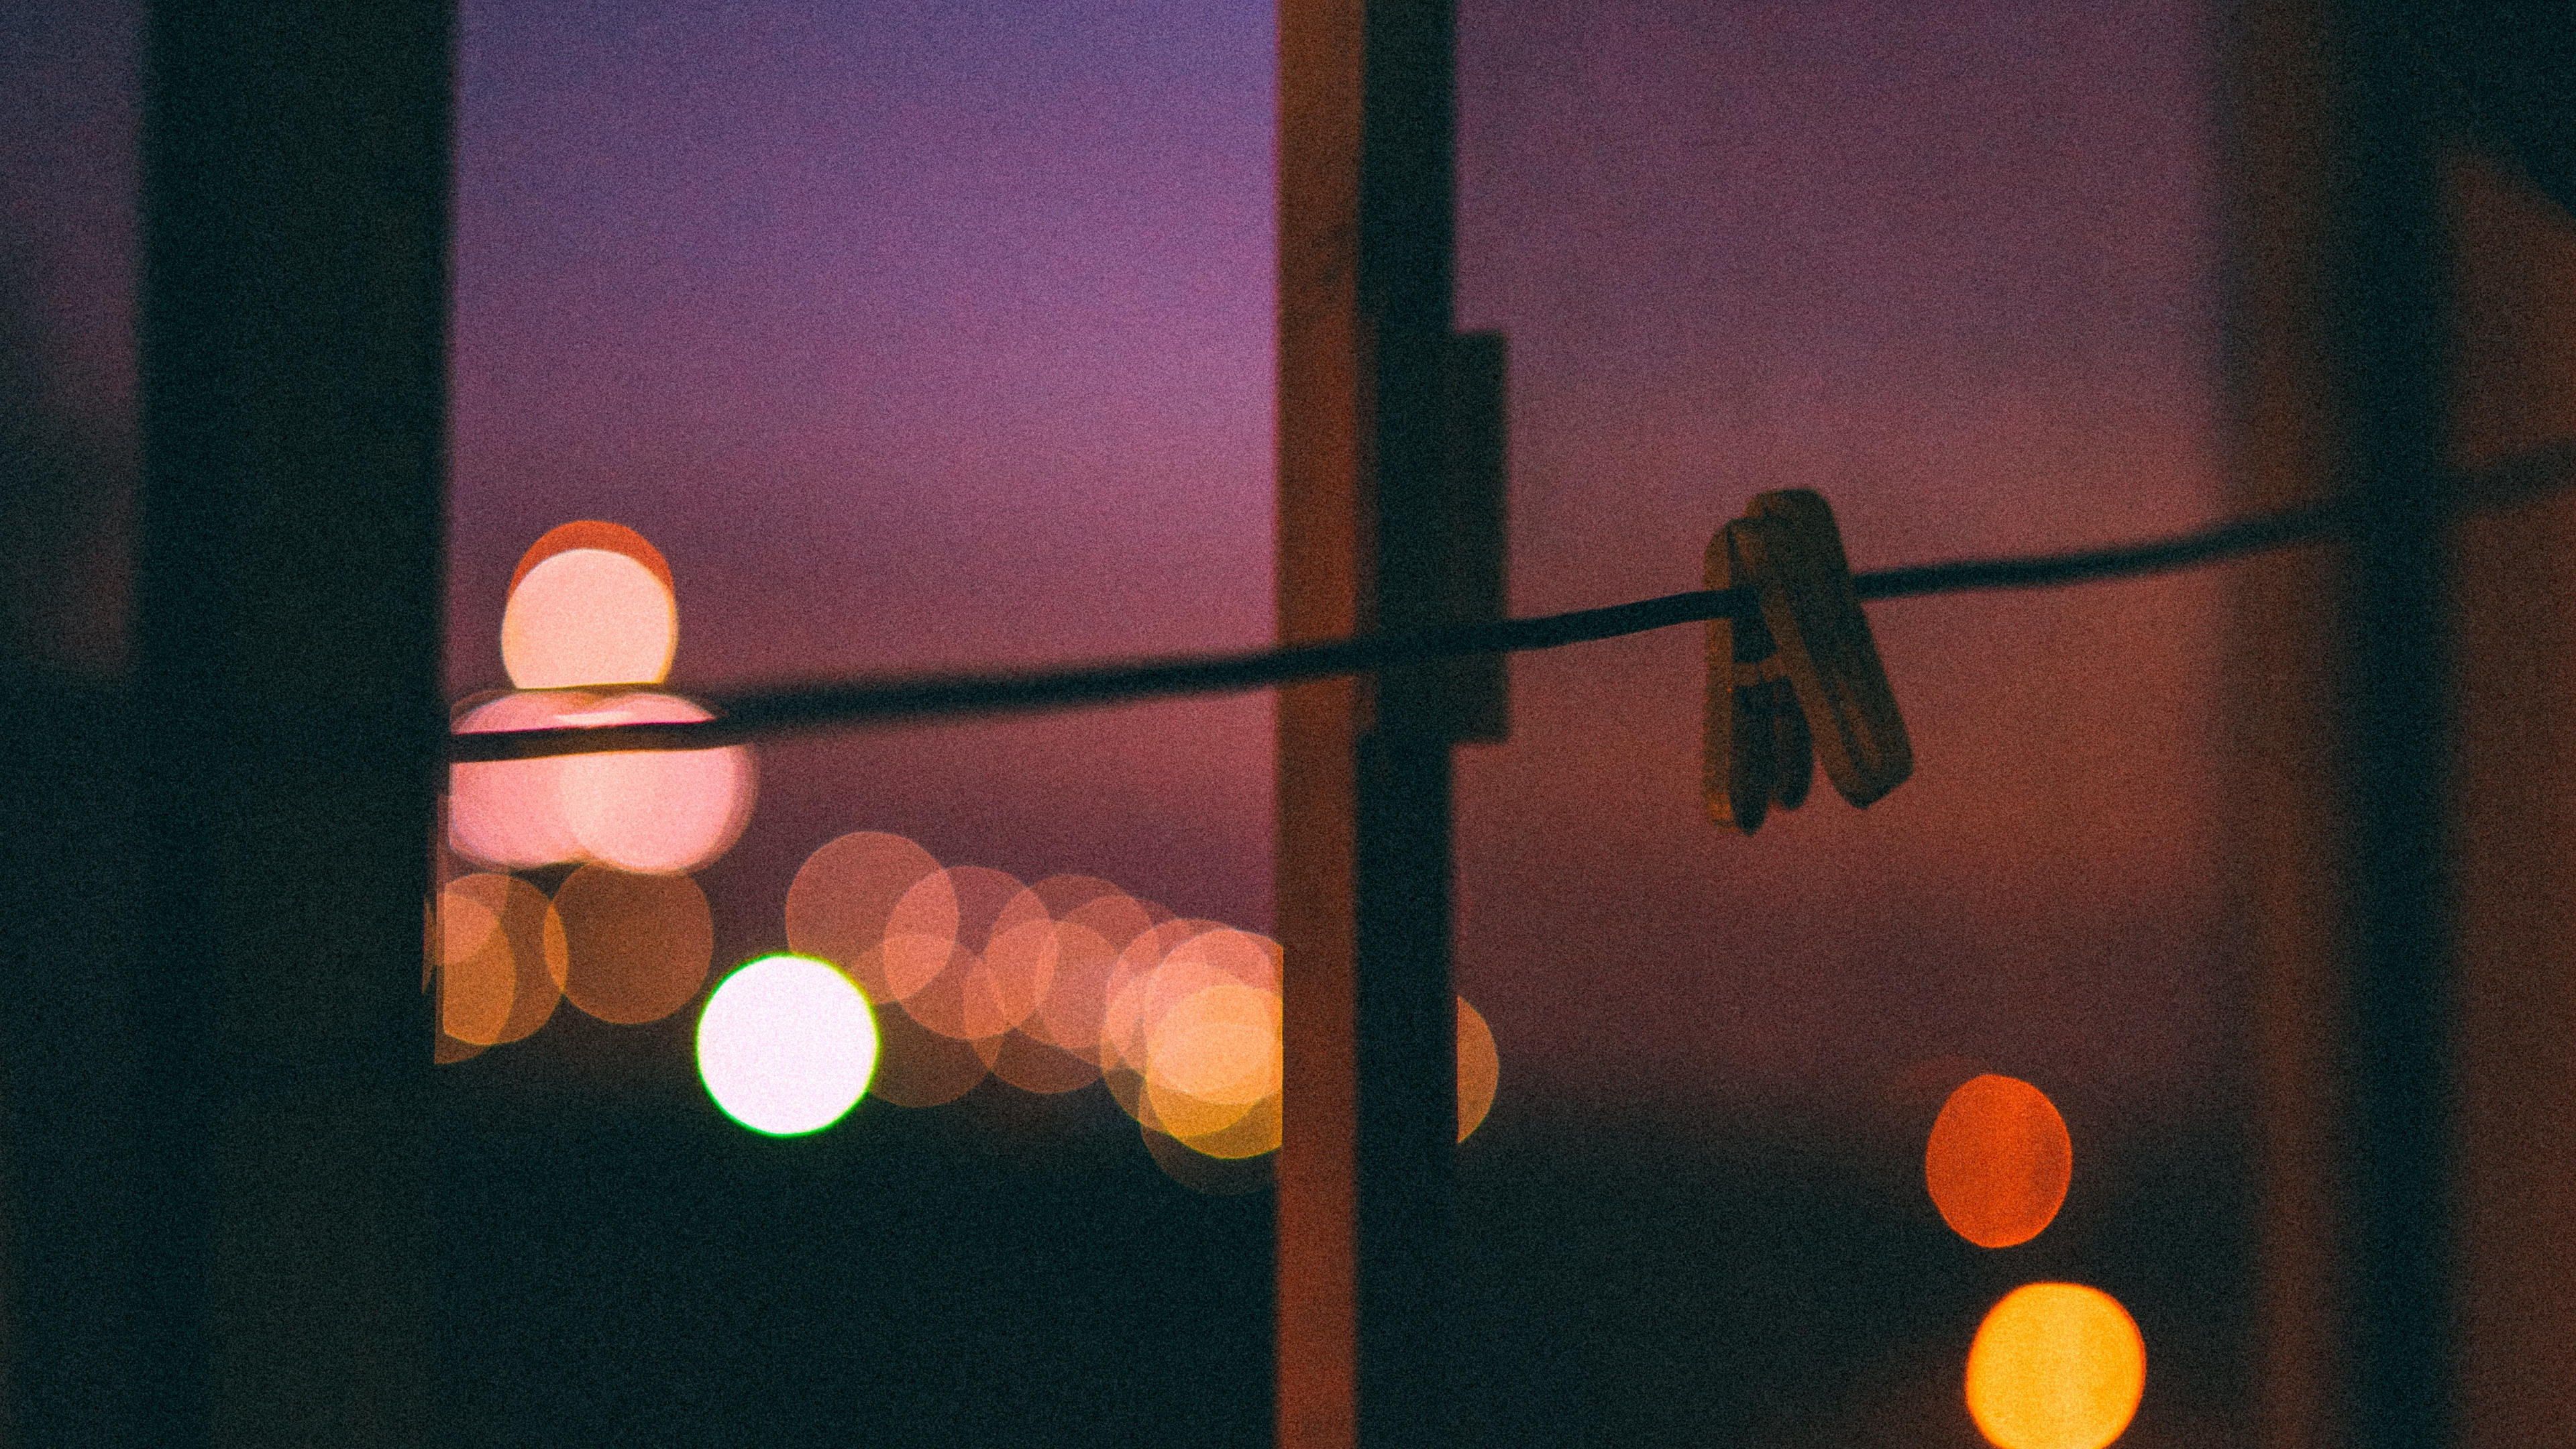 clothespin light window glare 4k 1540576421 - clothespin, light, window, glare 4k - Window, Light, clothespin